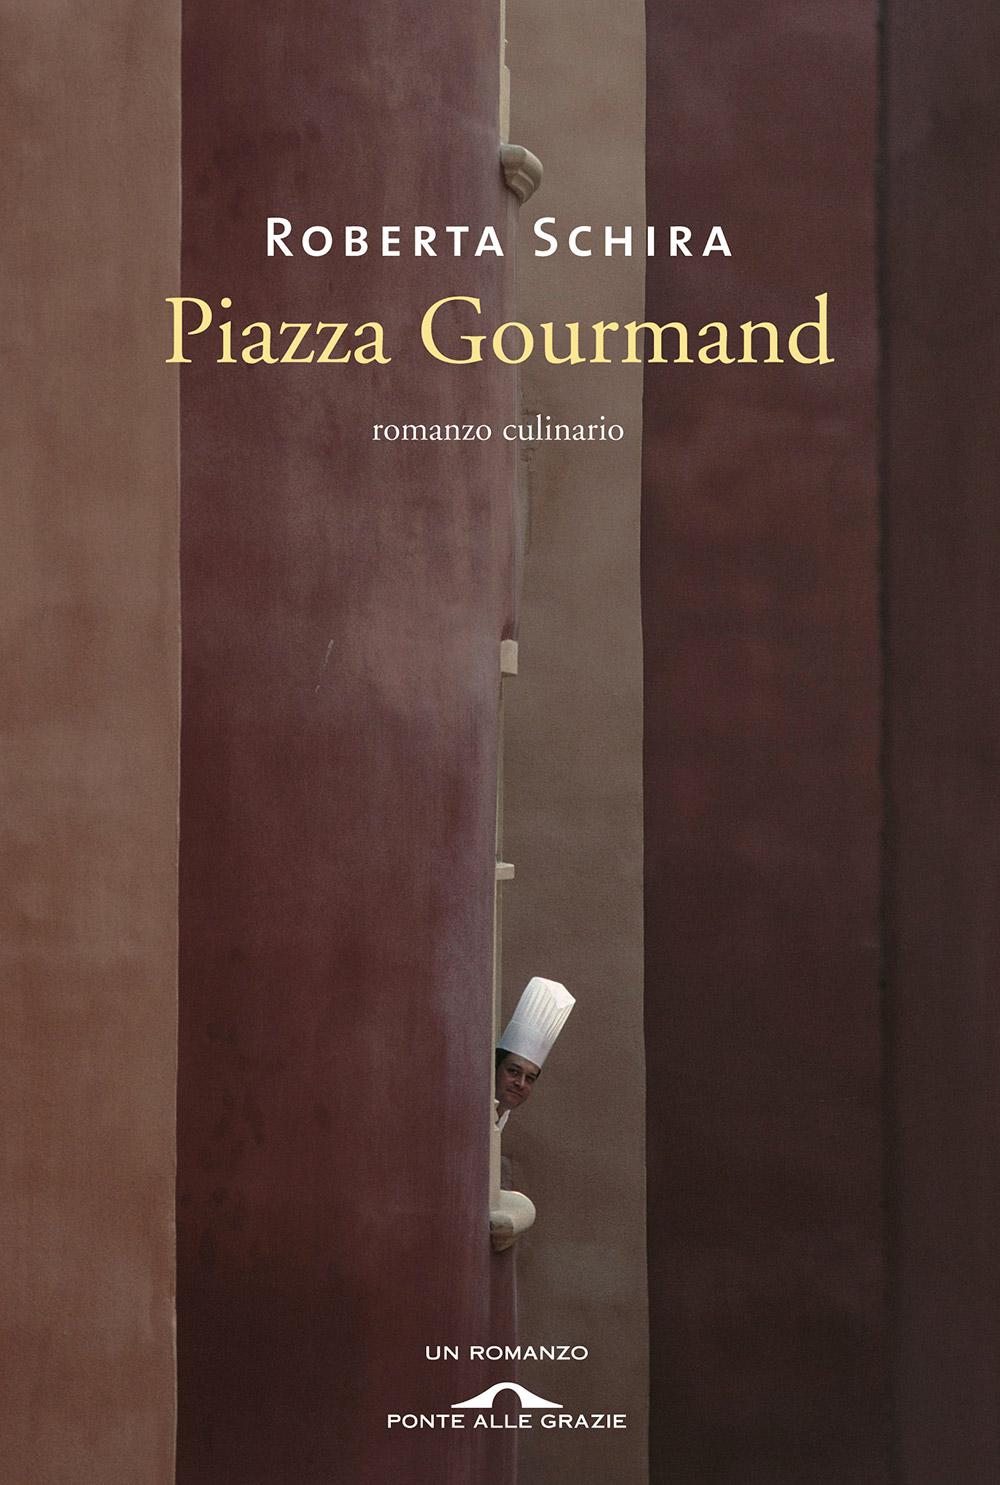 Roberta Schira - Piazza Gourmand - Ponte alle Grazie